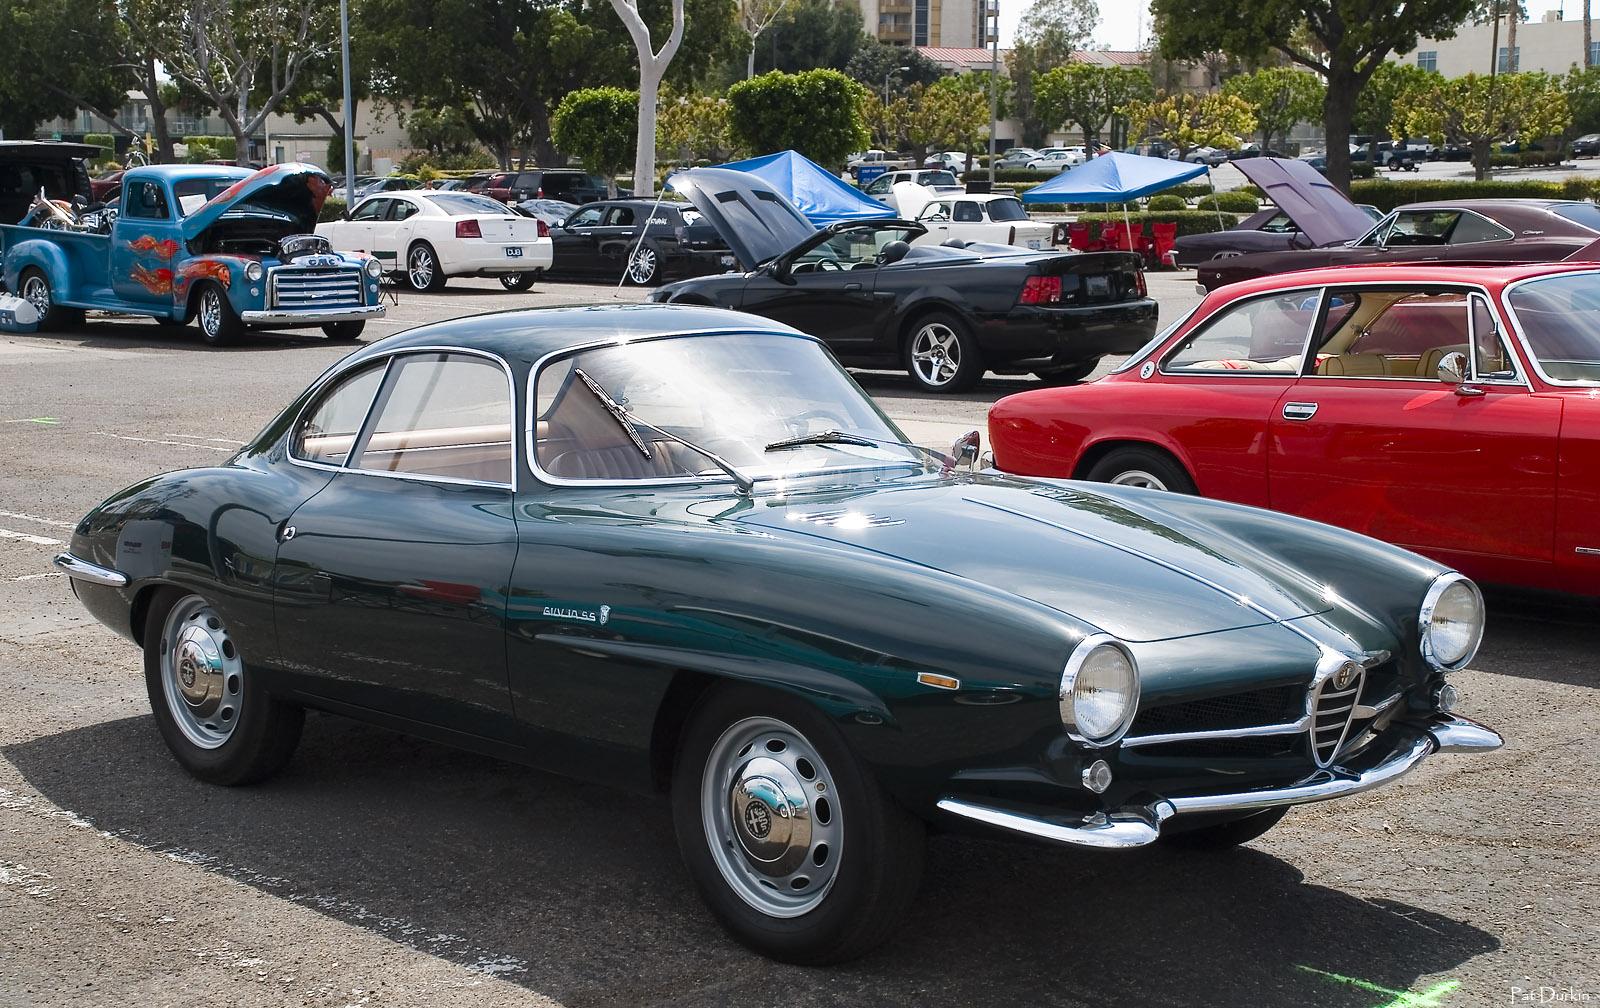 1964_Alfa_Romeo_Giulia_Sprint_Speciale_-_green_-_fvr.jpg